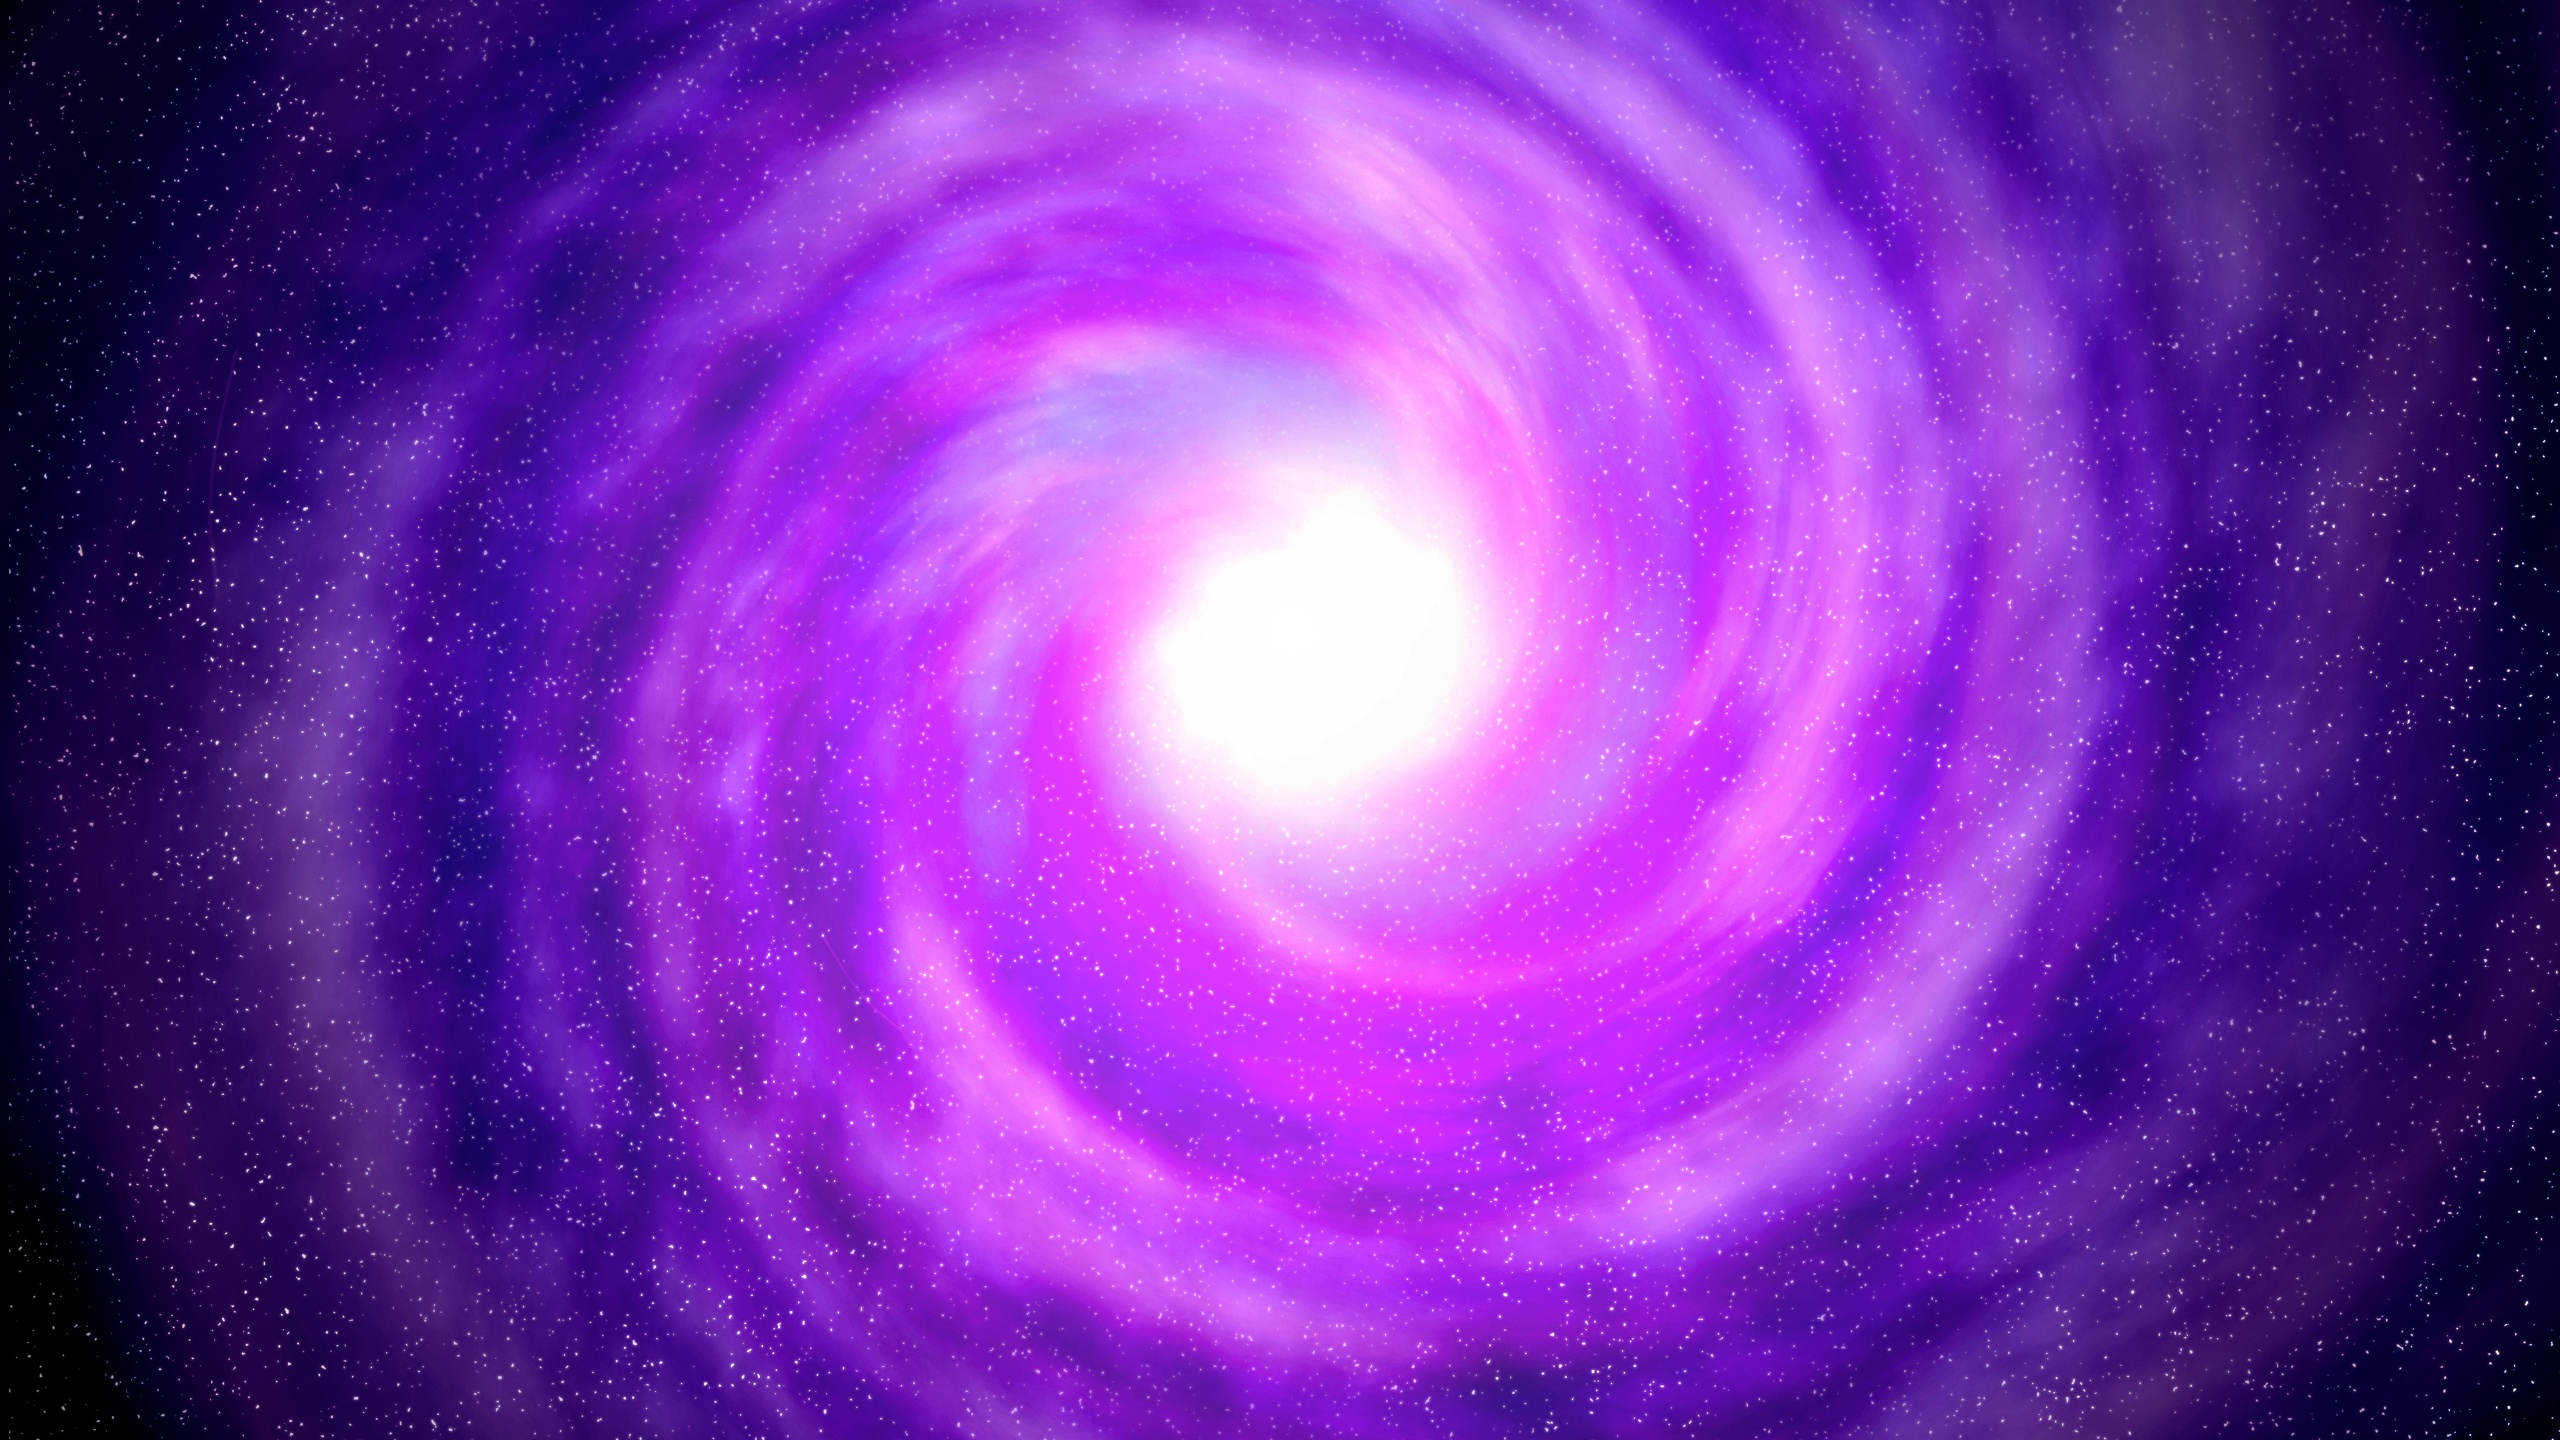 2560x1440 black hole - photo #12